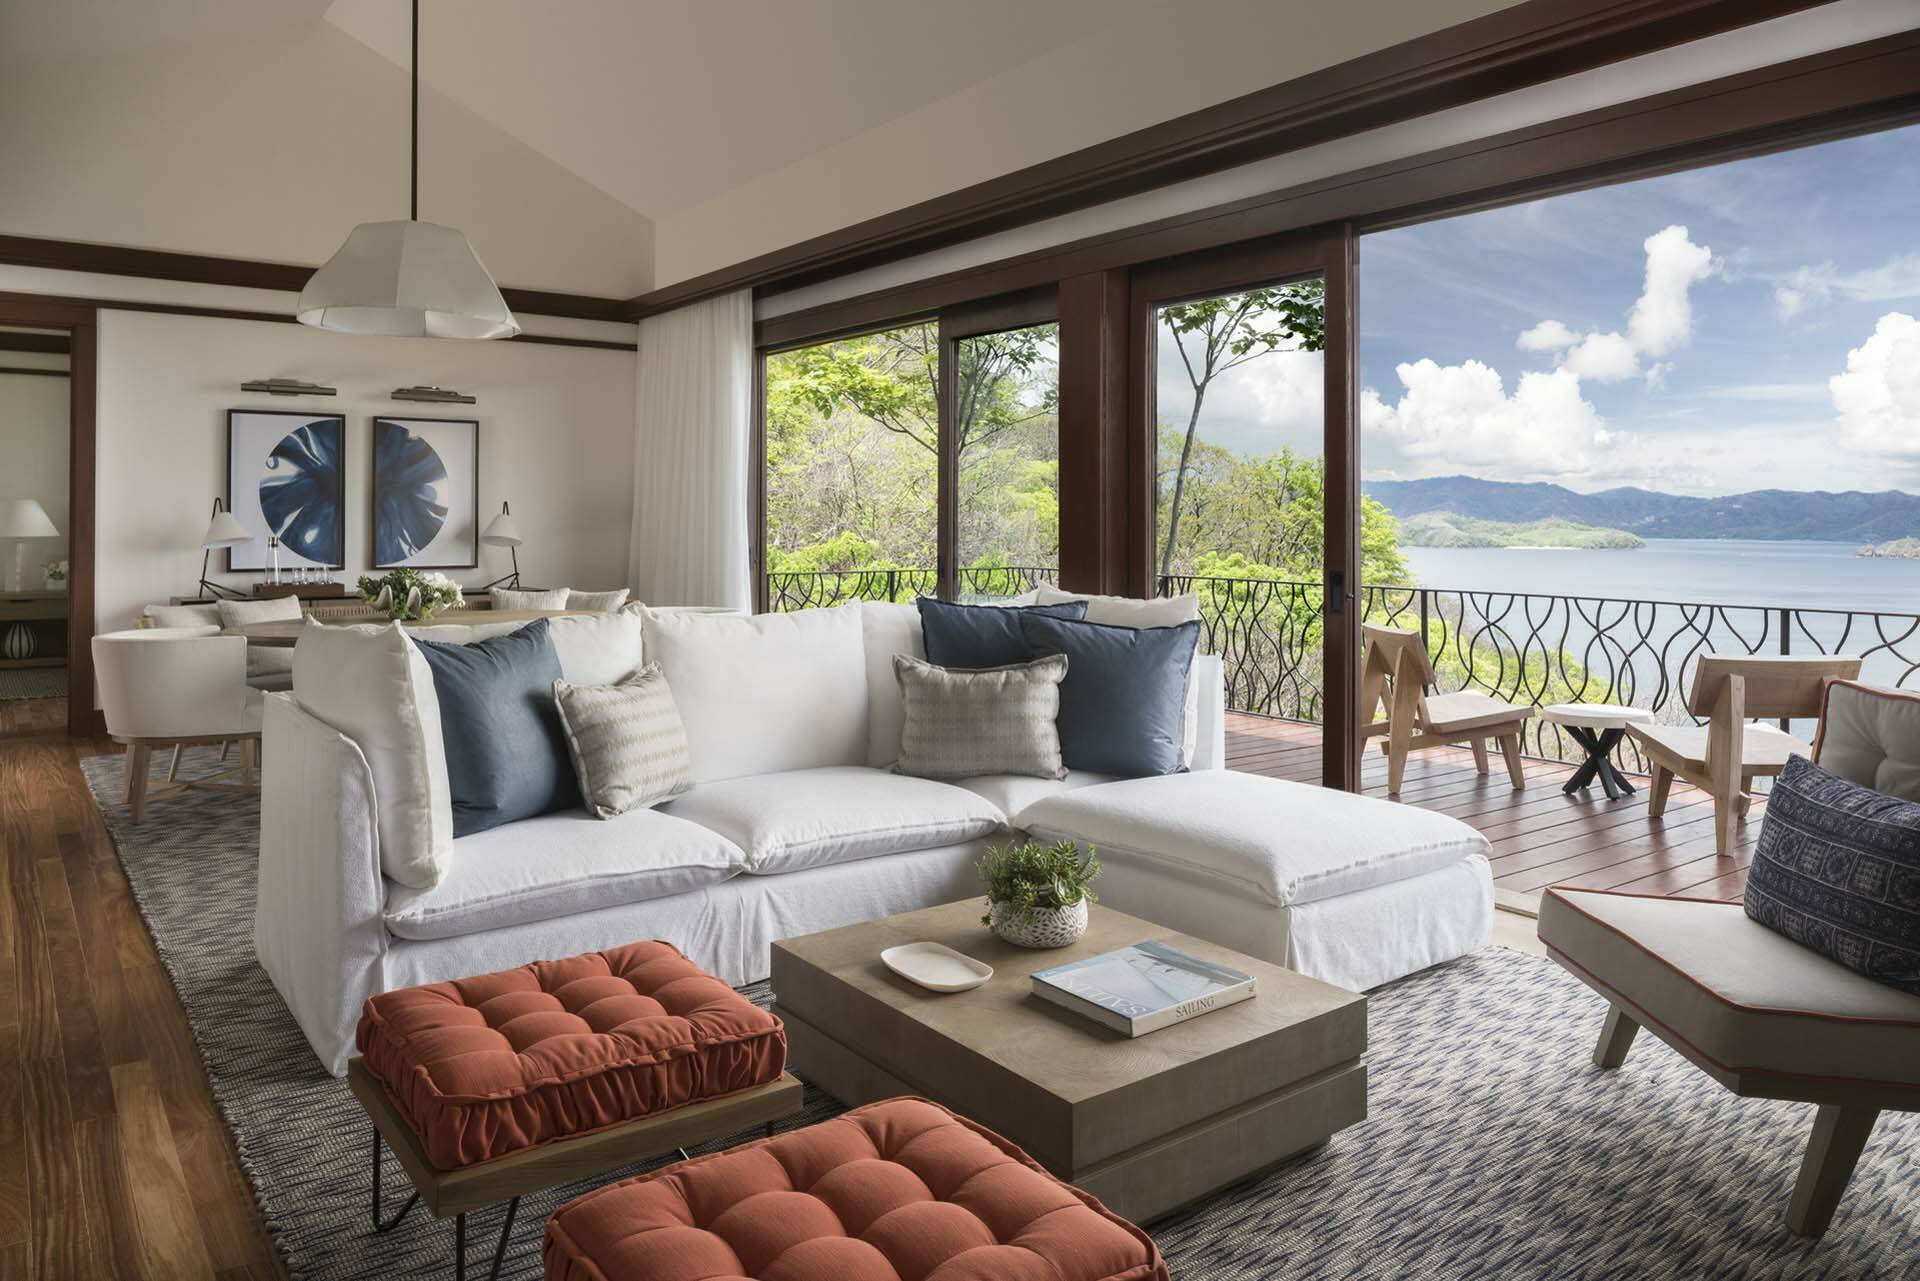 Costa Rica Four Seasons Papagayo suite salon vue ocean